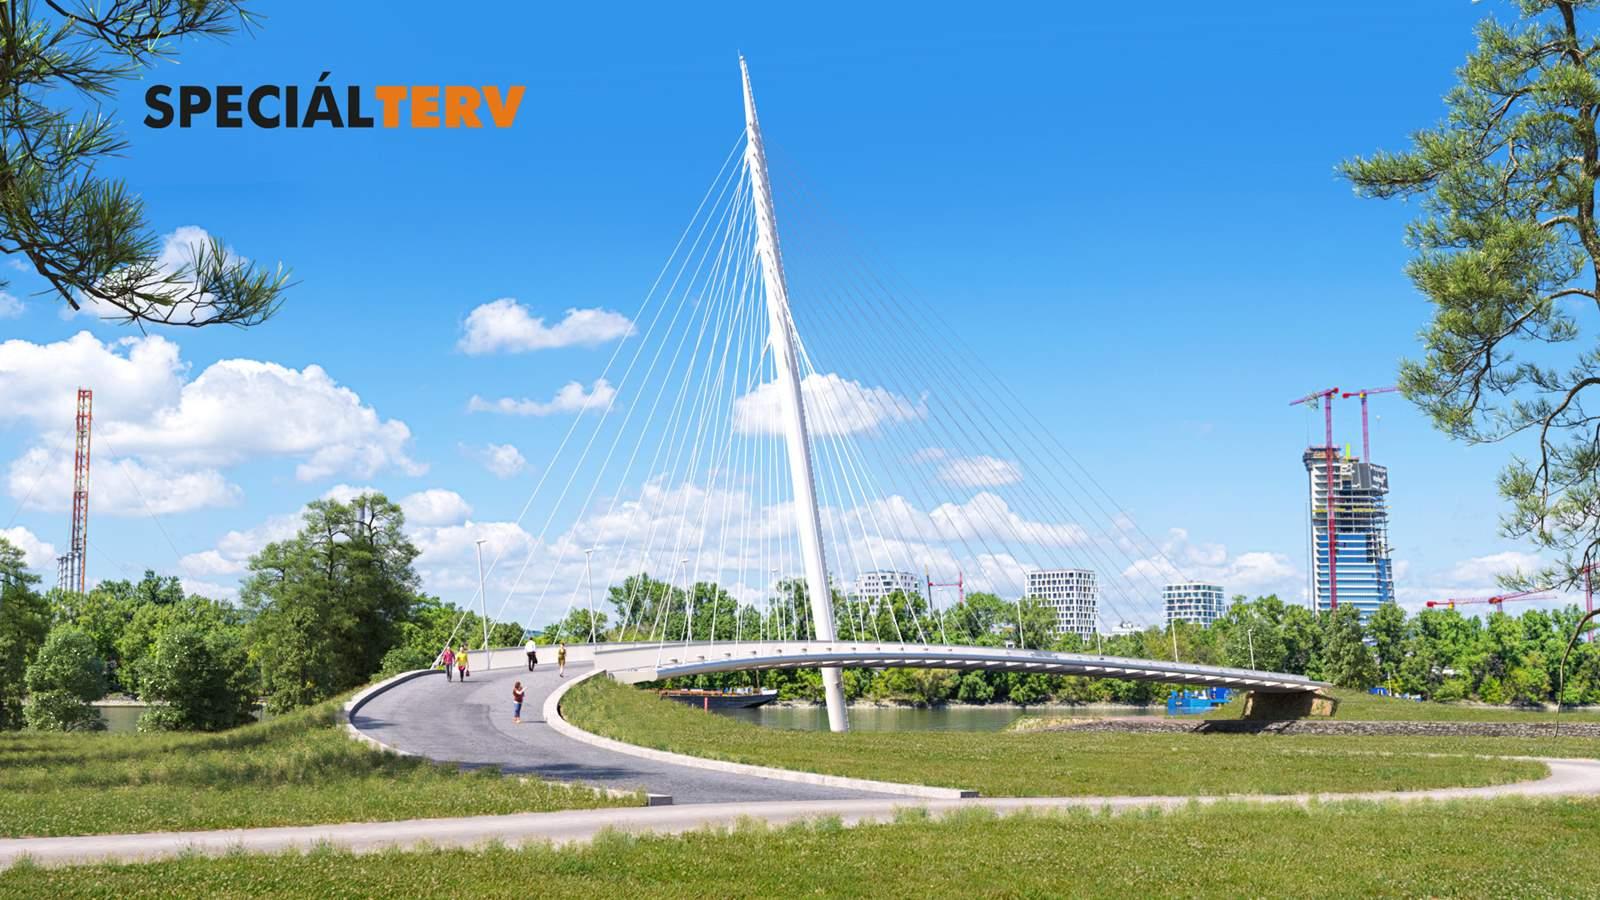 robinson híd atlétikai stadion (Copy)